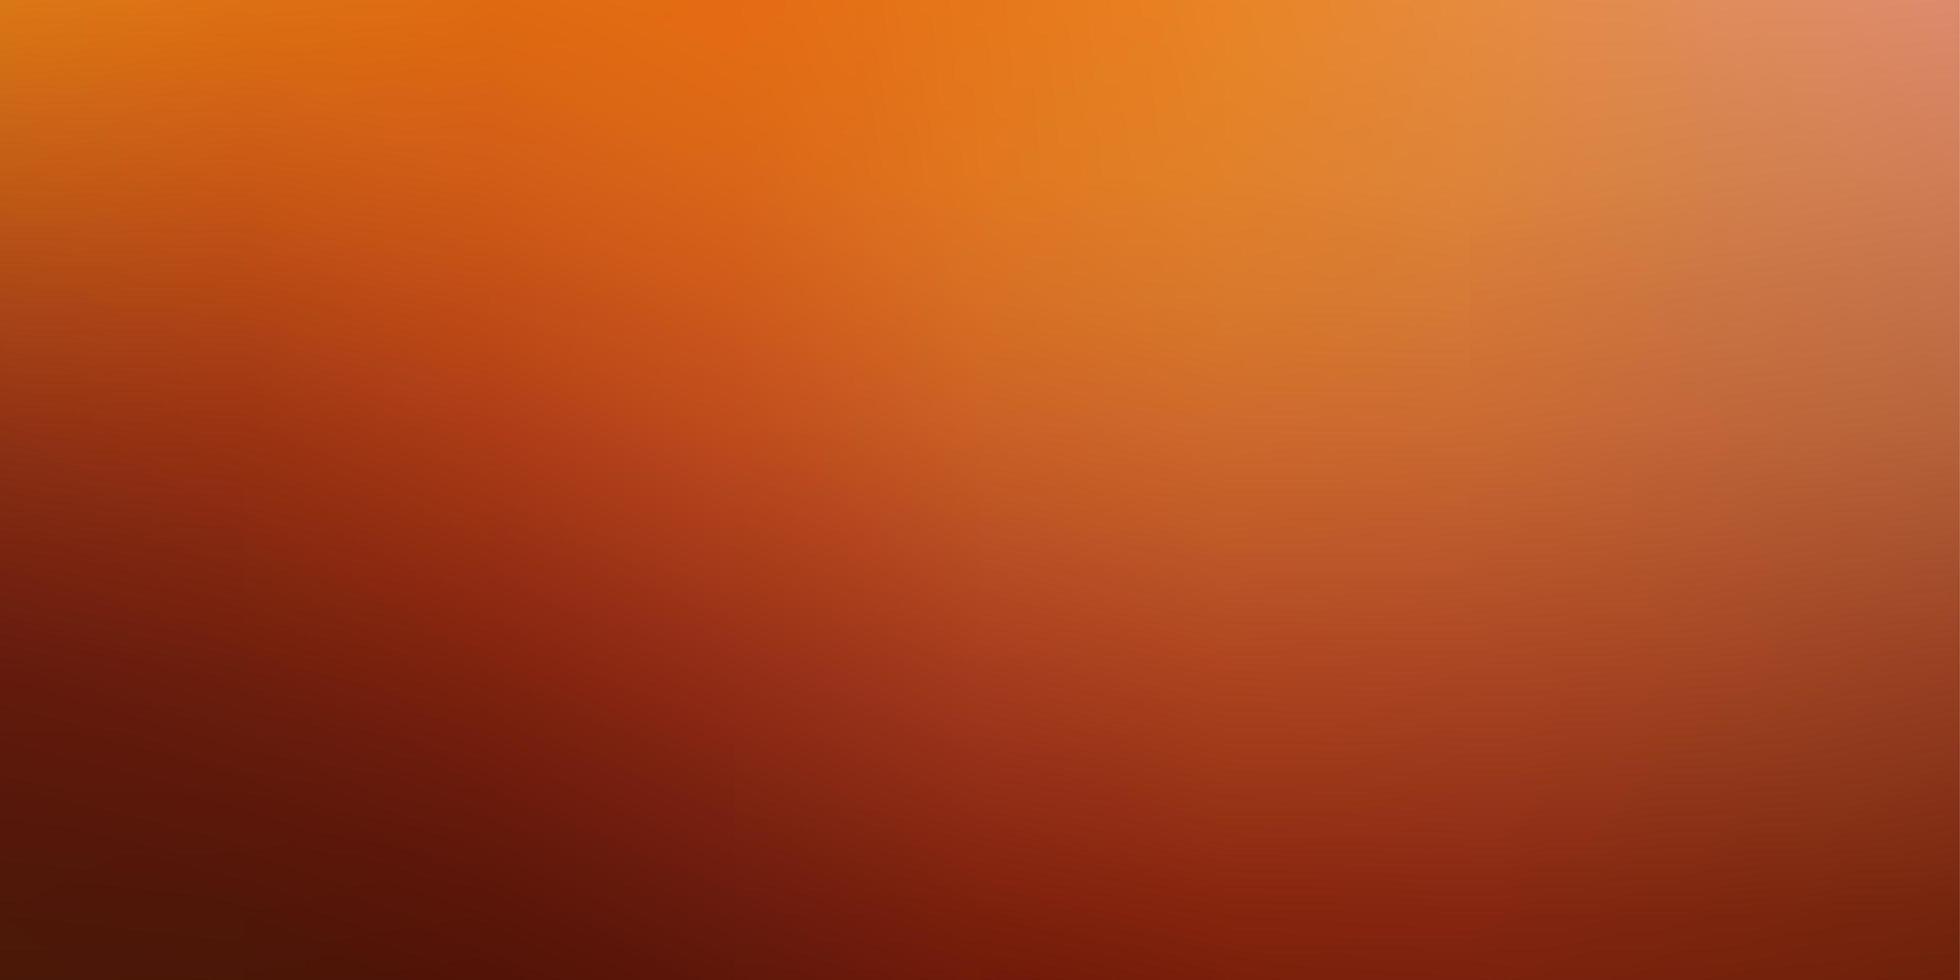 ljus orange vektor abstrakt suddig bakgrund.